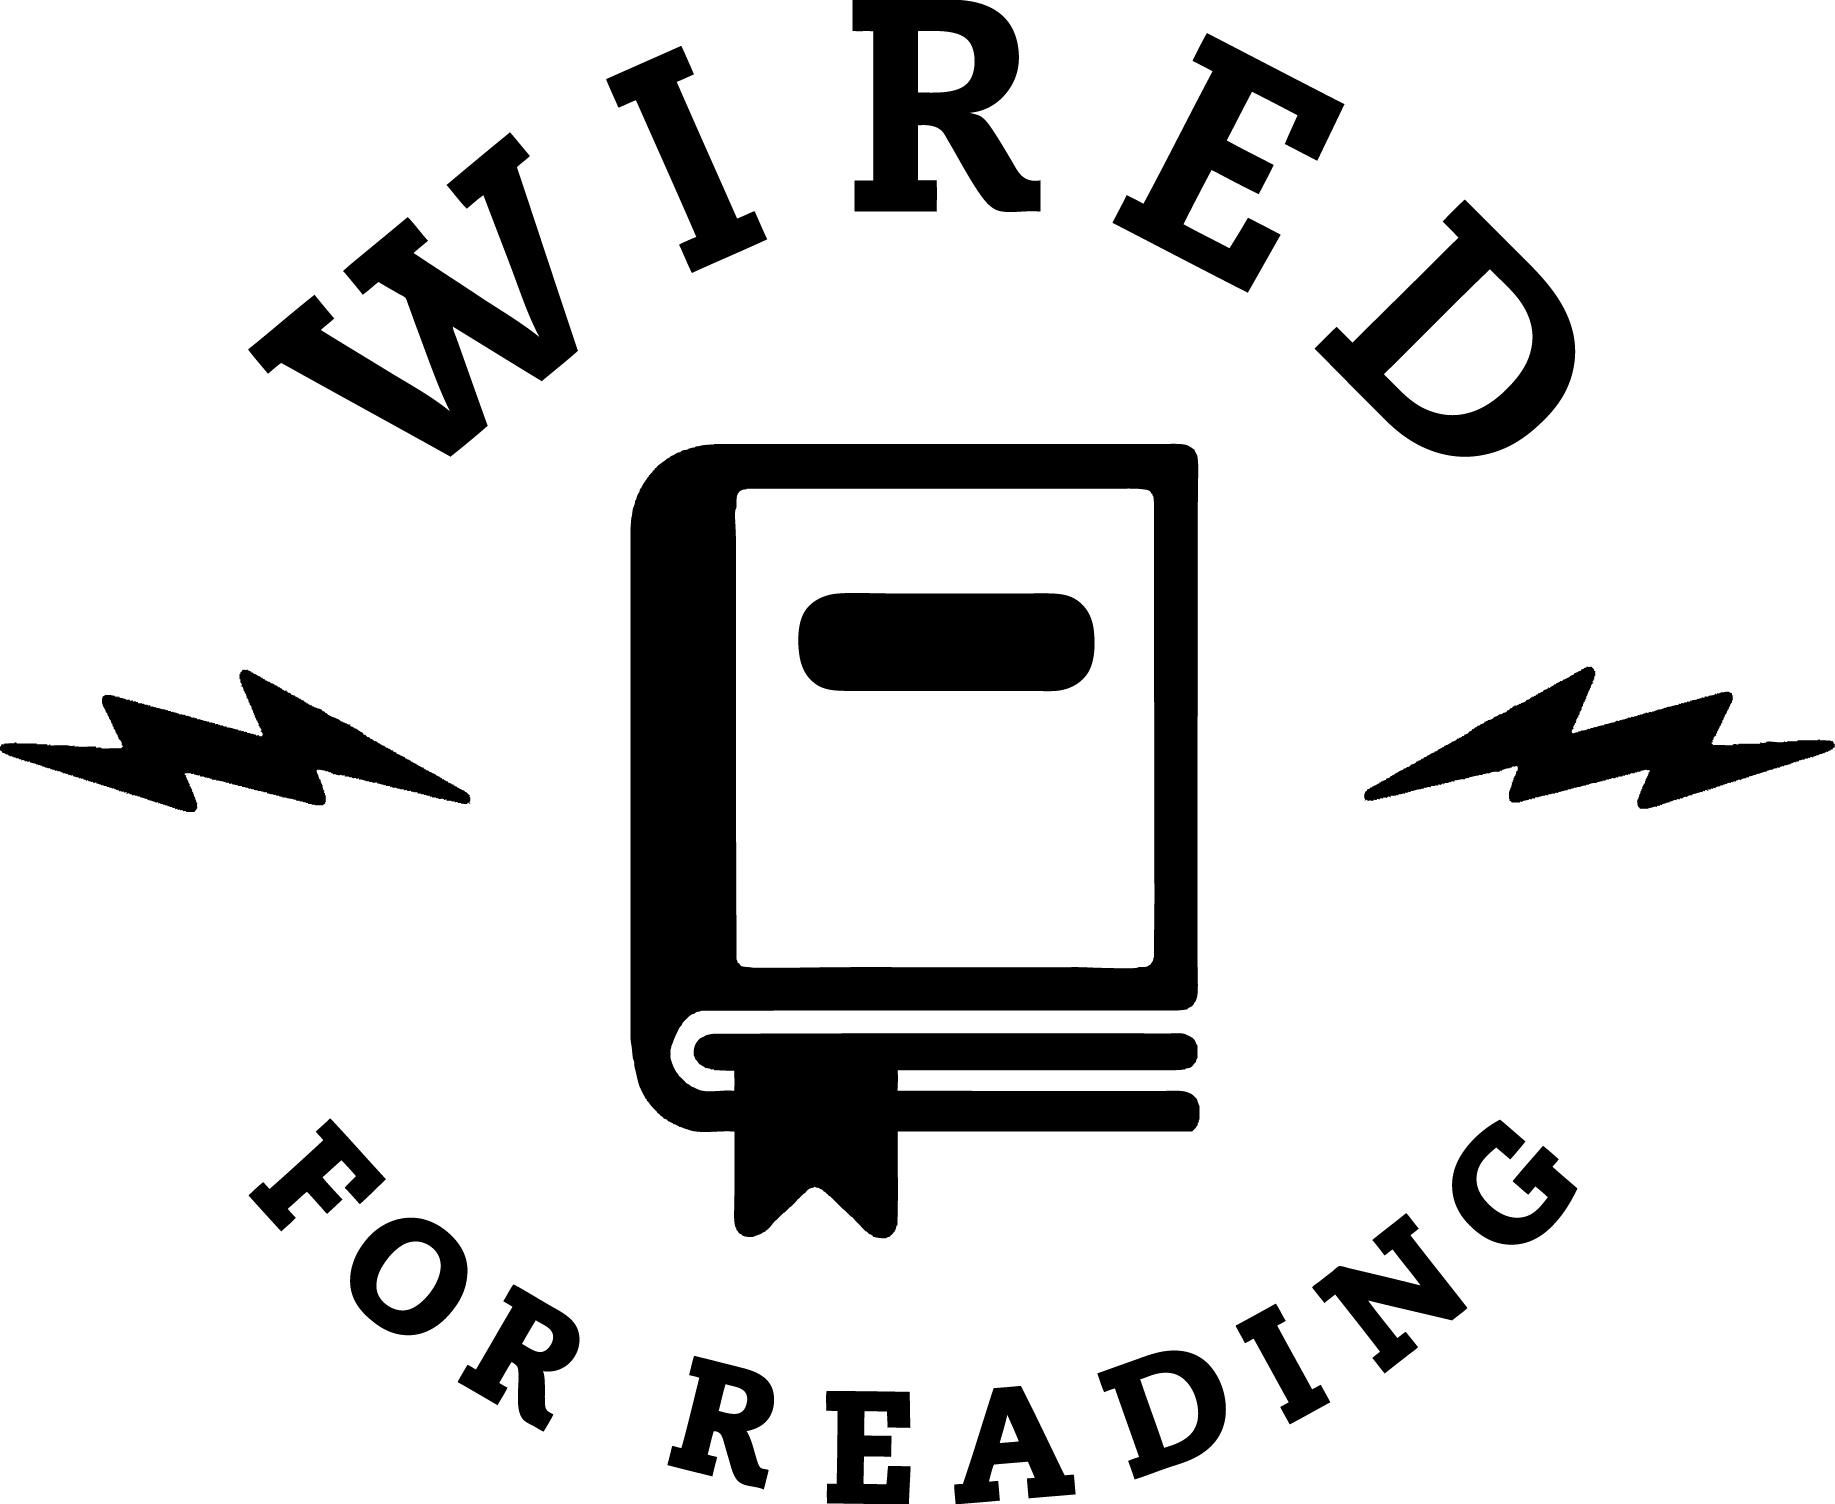 Wfr logo black